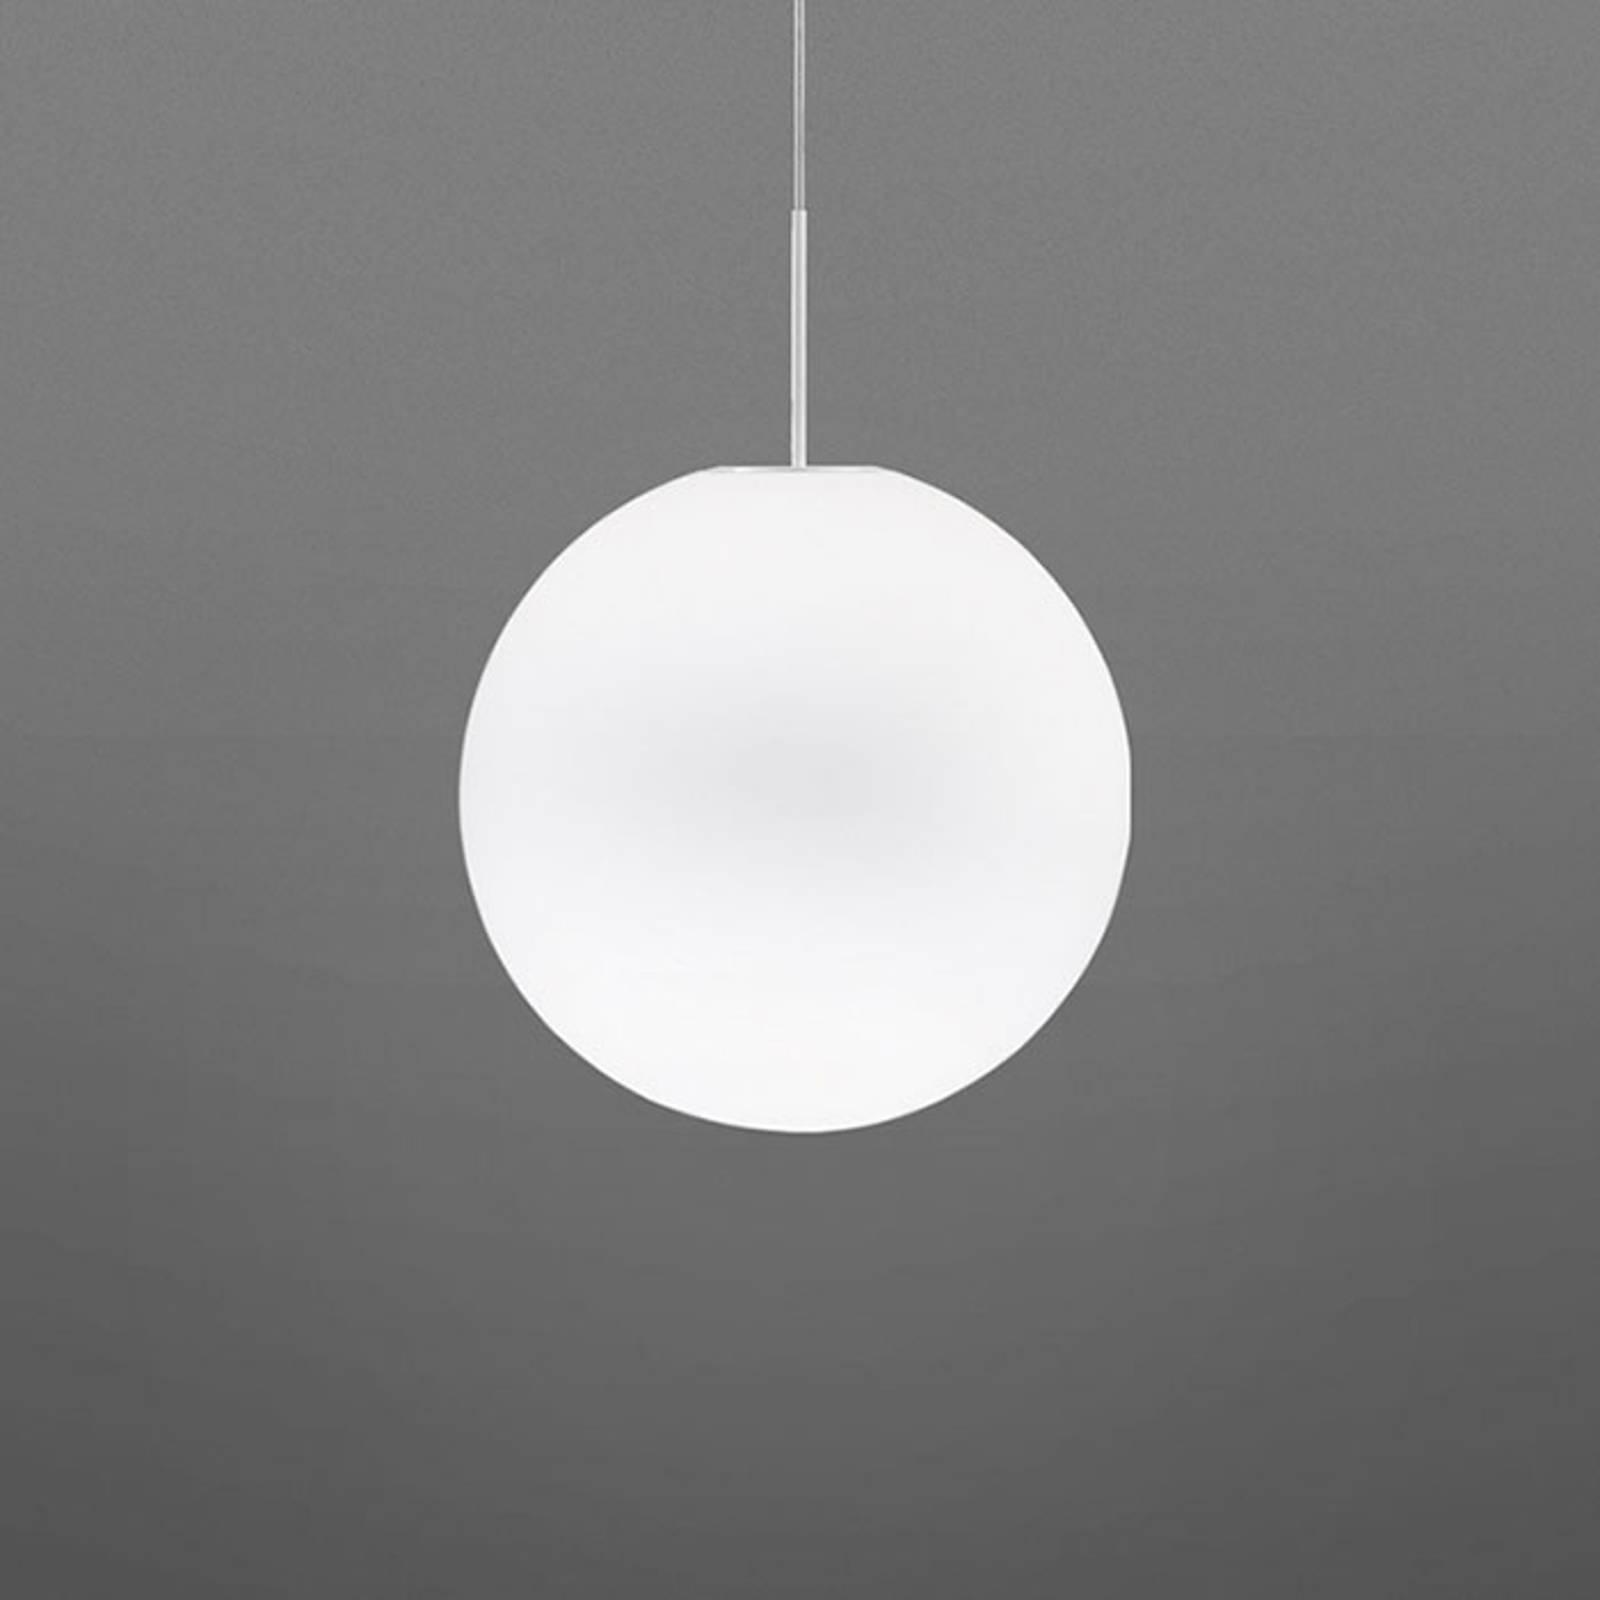 Fabbian Lumi Sfera glazen hanglamp, Ø 14 cm